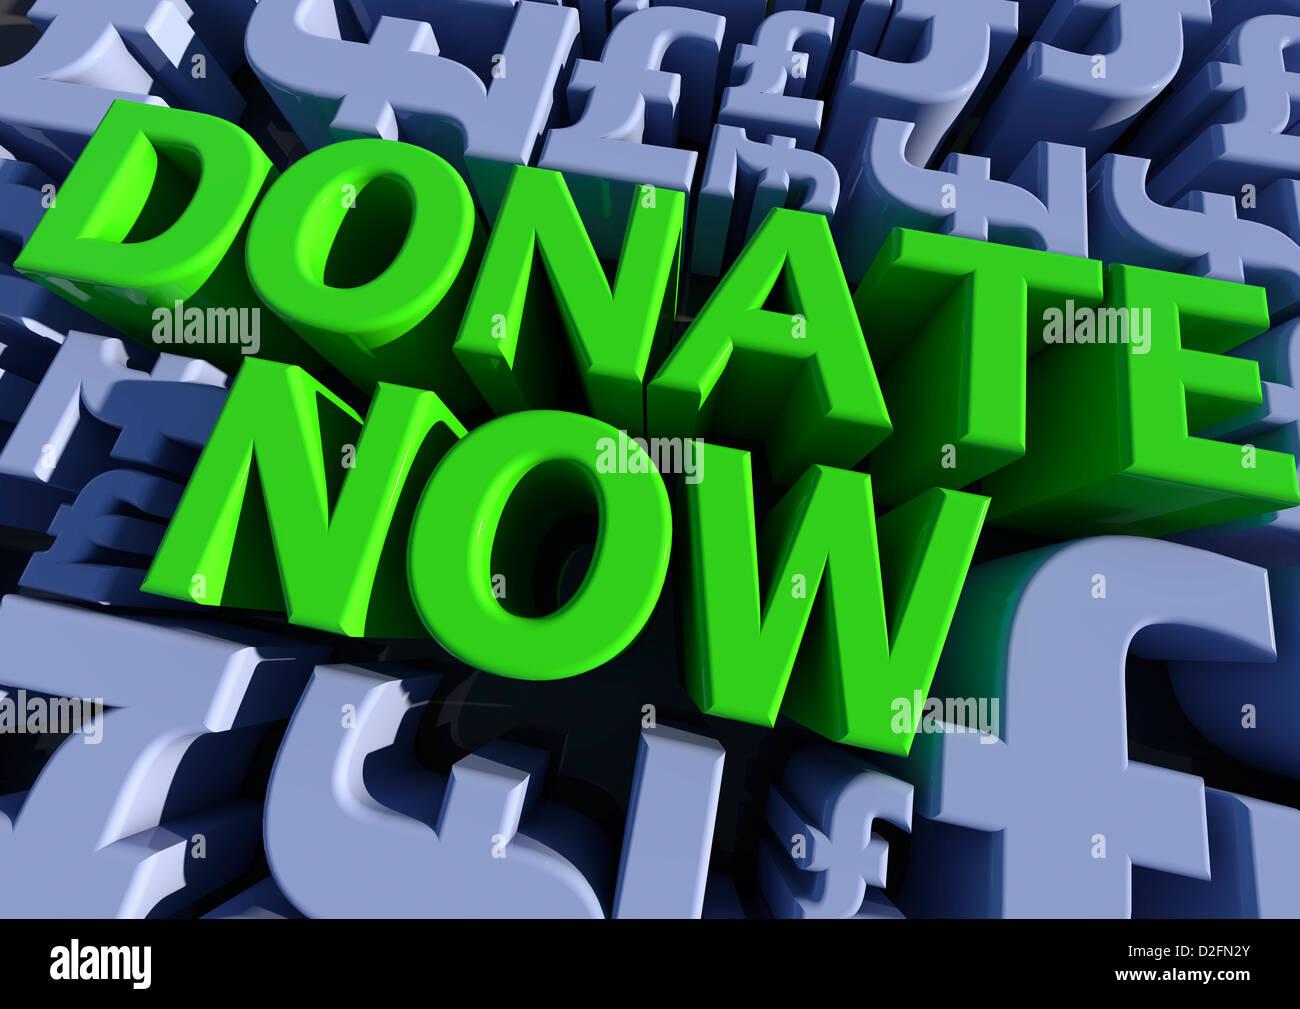 'DONATE NOW' surrounded by British pound symbols - Stock Image